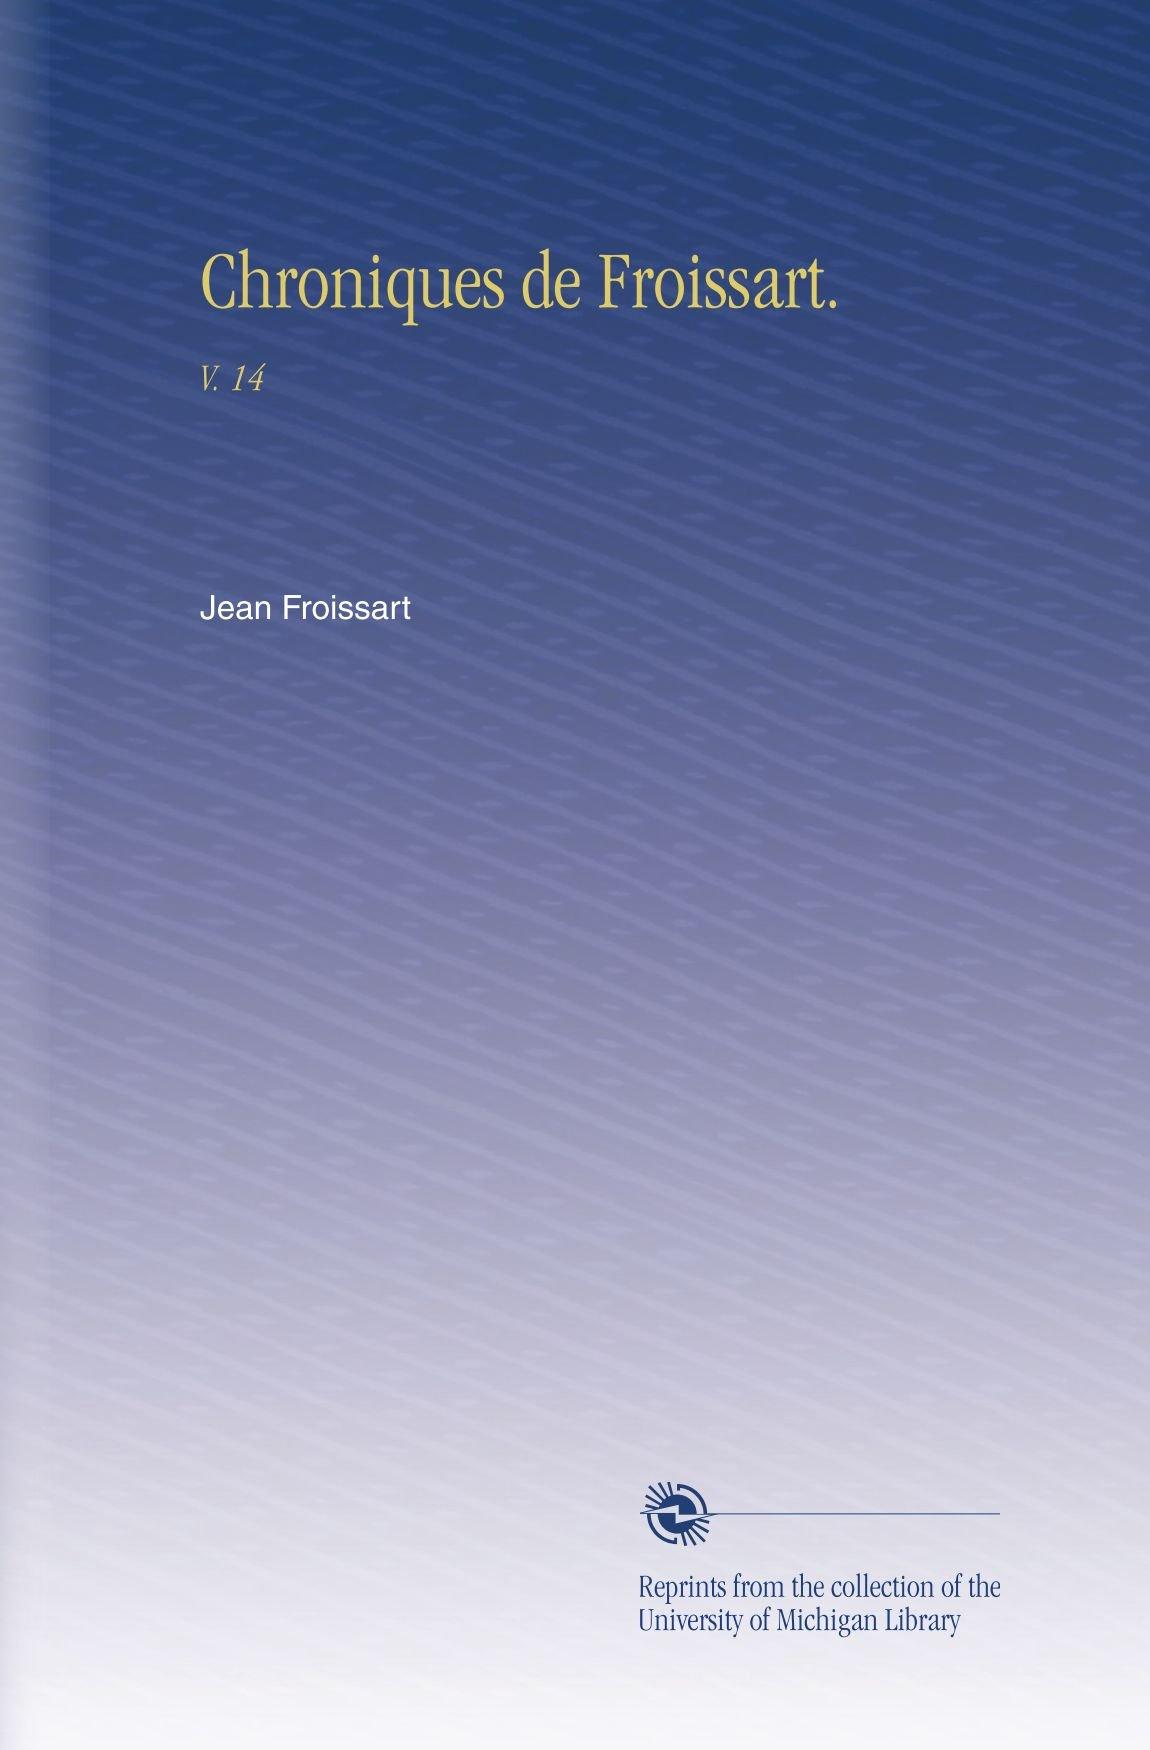 Download Chroniques de Froissart.: V. 14 (French Edition) pdf